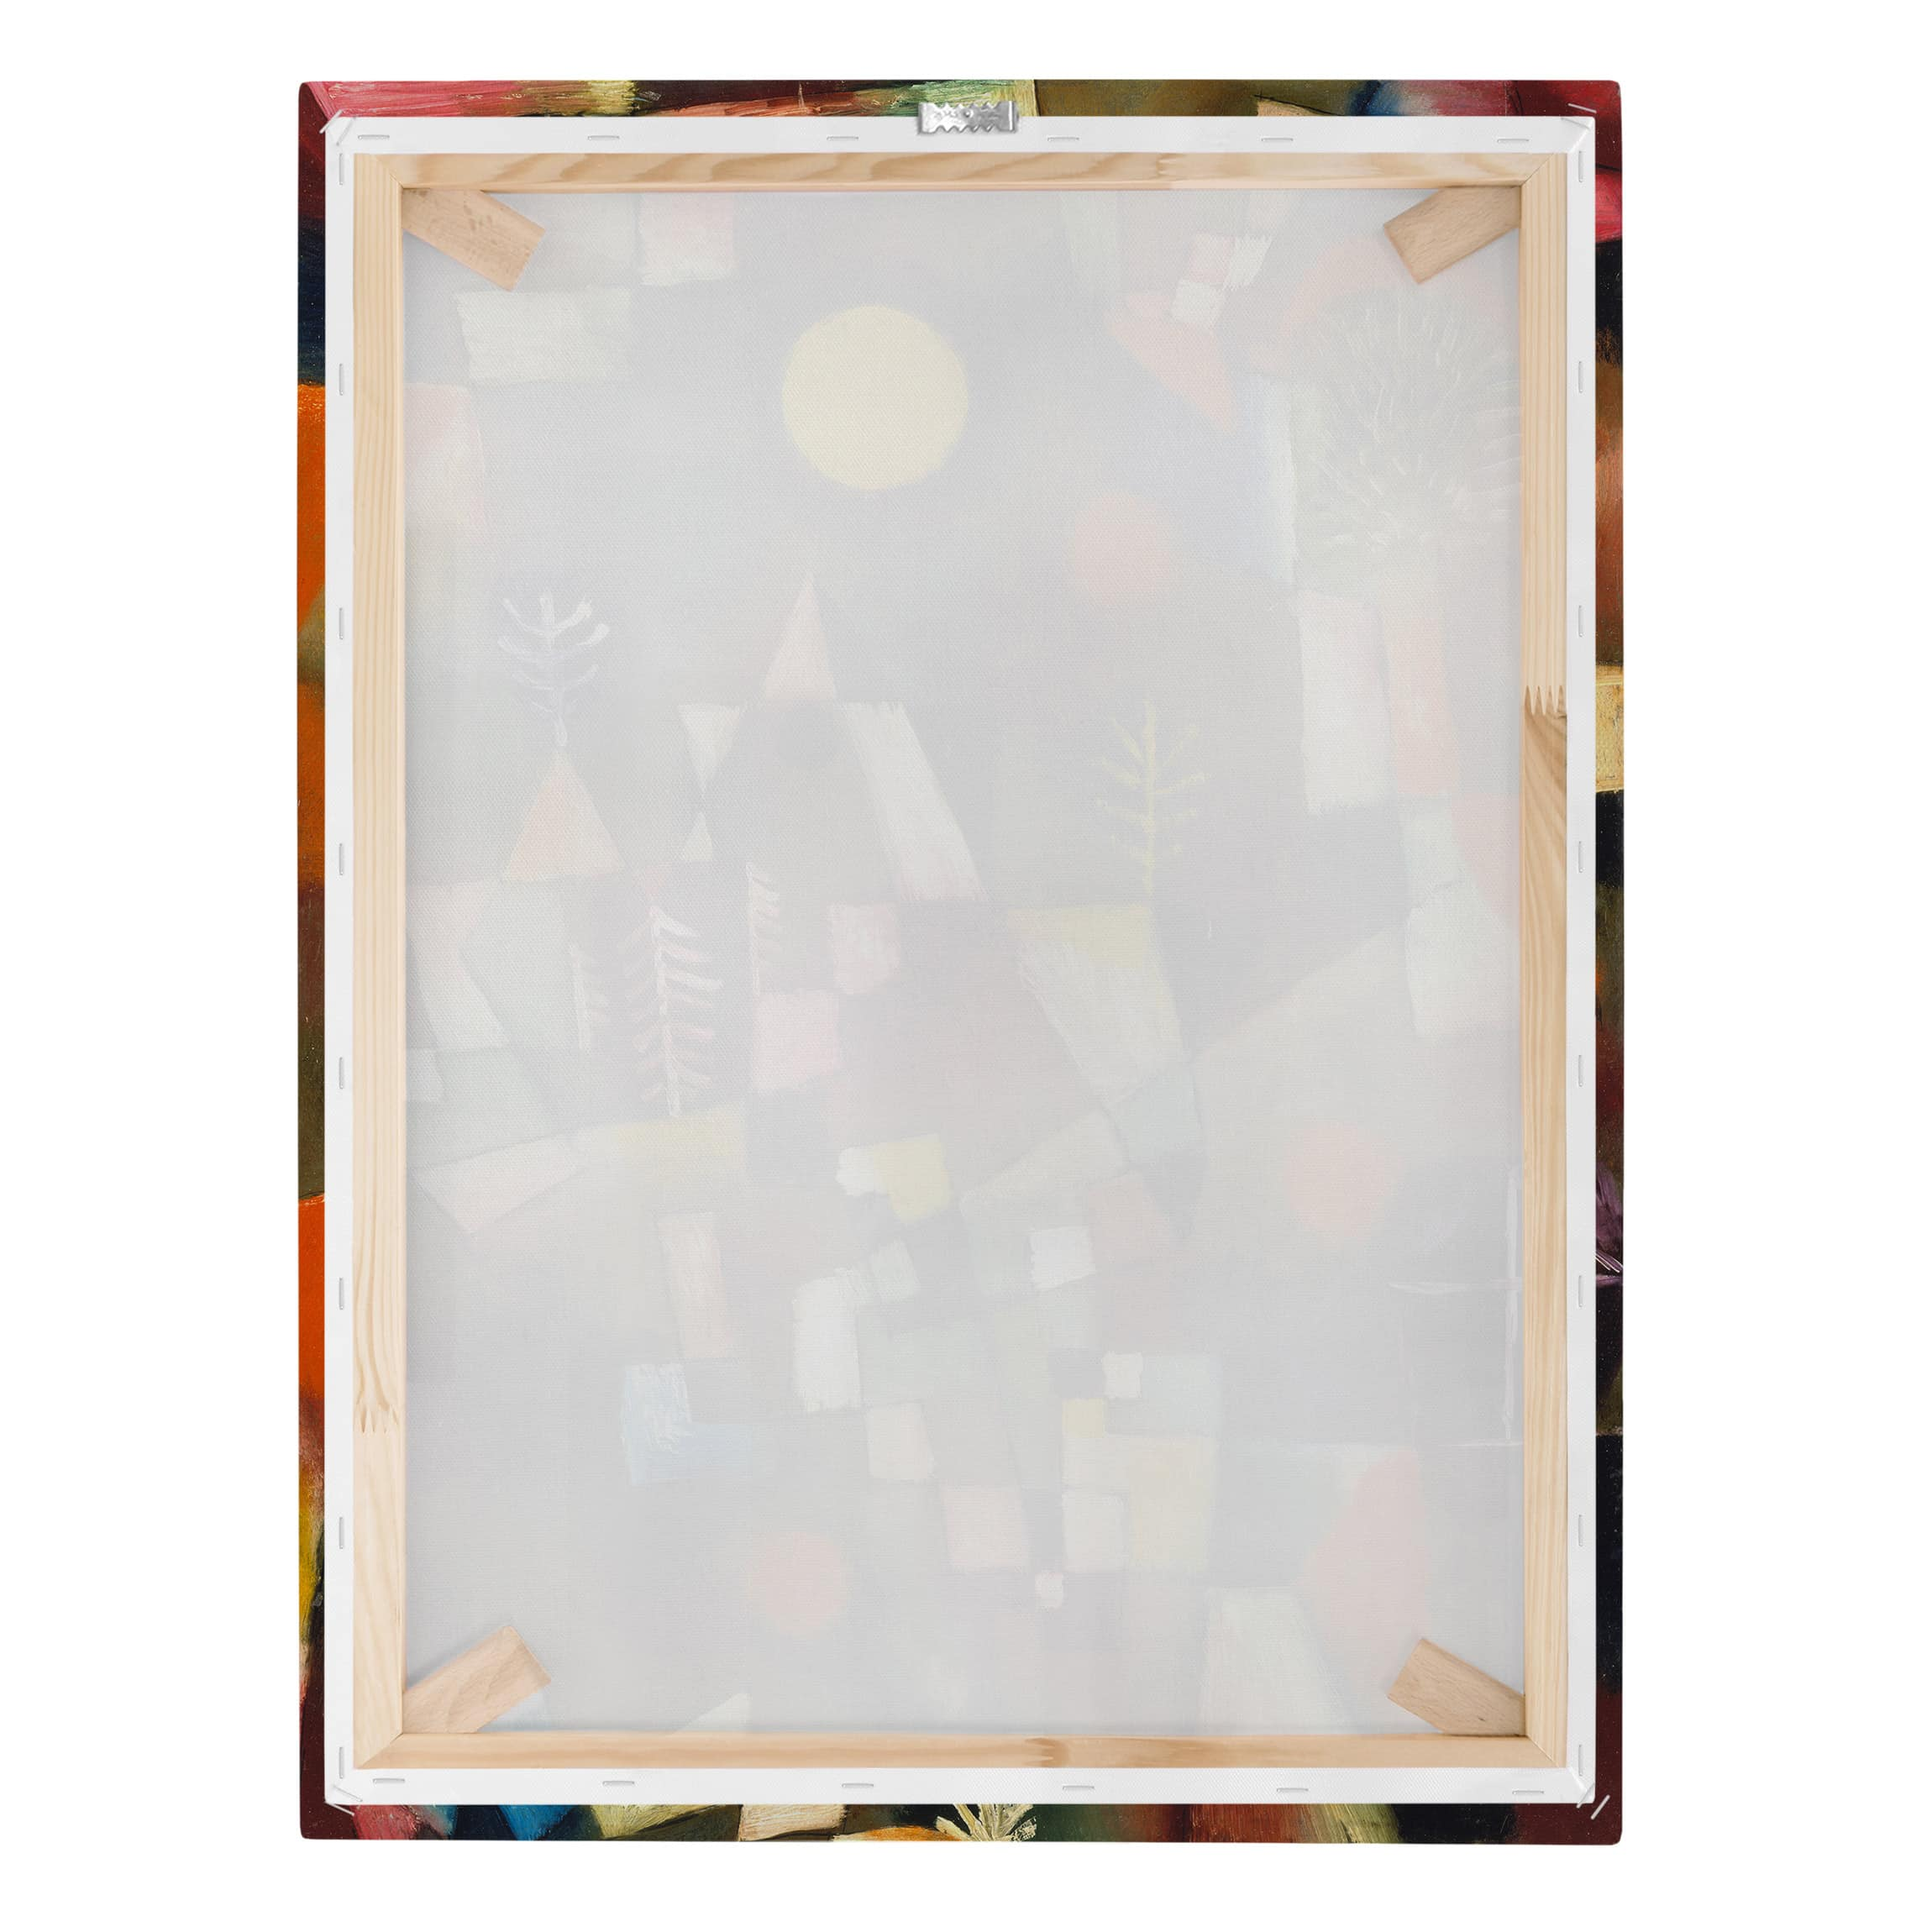 Stampa su tela paul klee la luna piena verticale 4 3 for Stampe su tela ikea